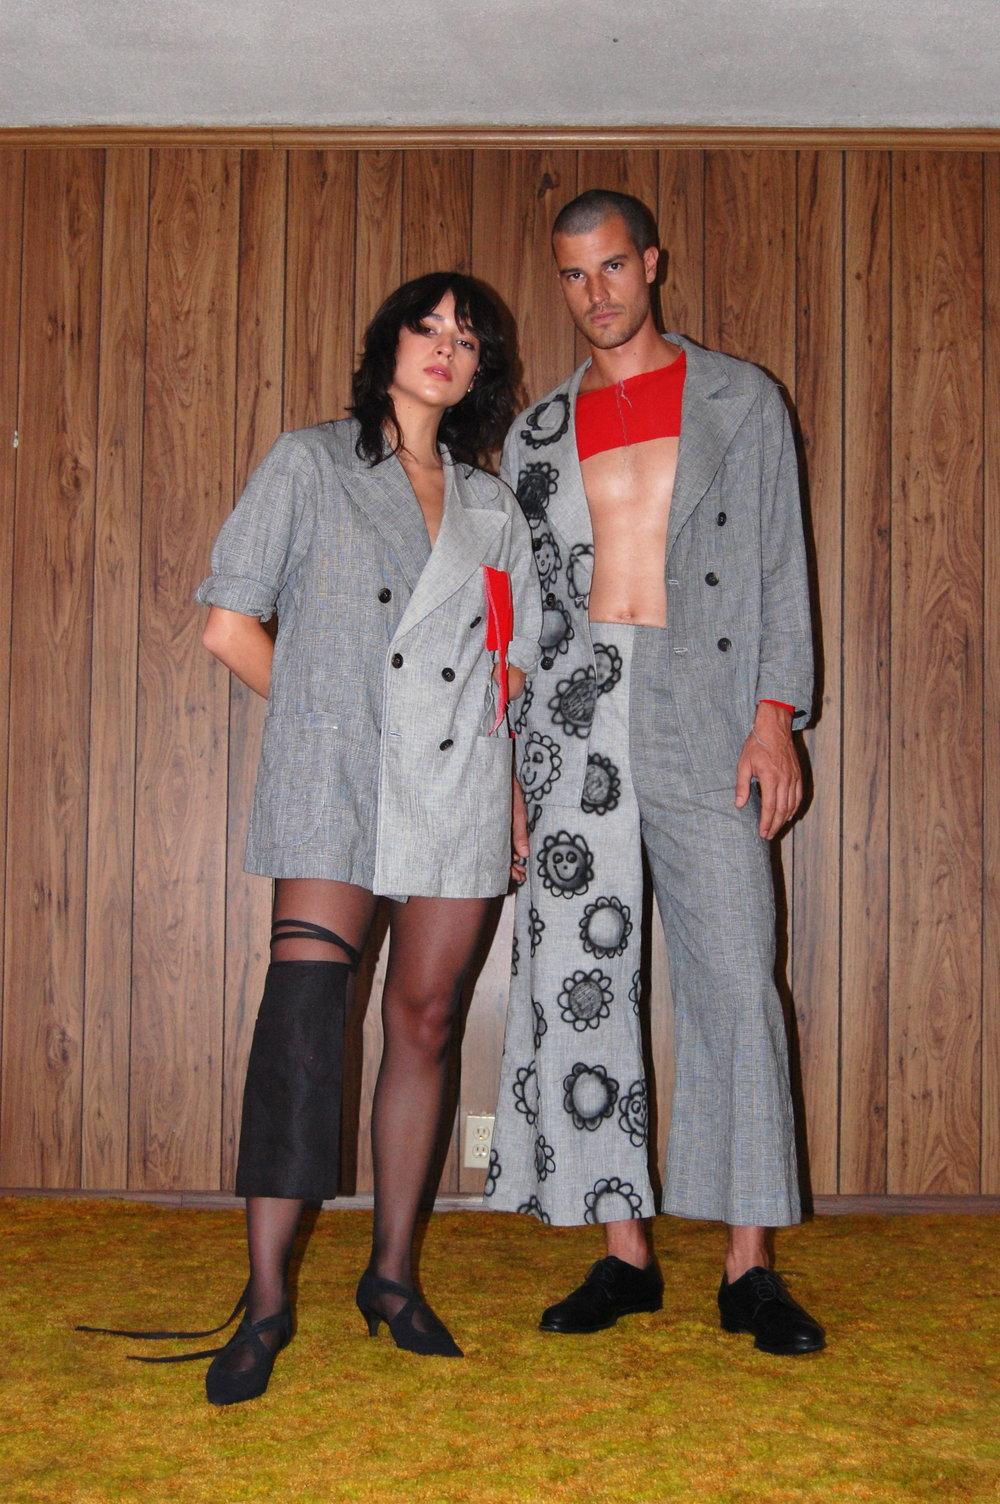 suit jackets both models.JPG